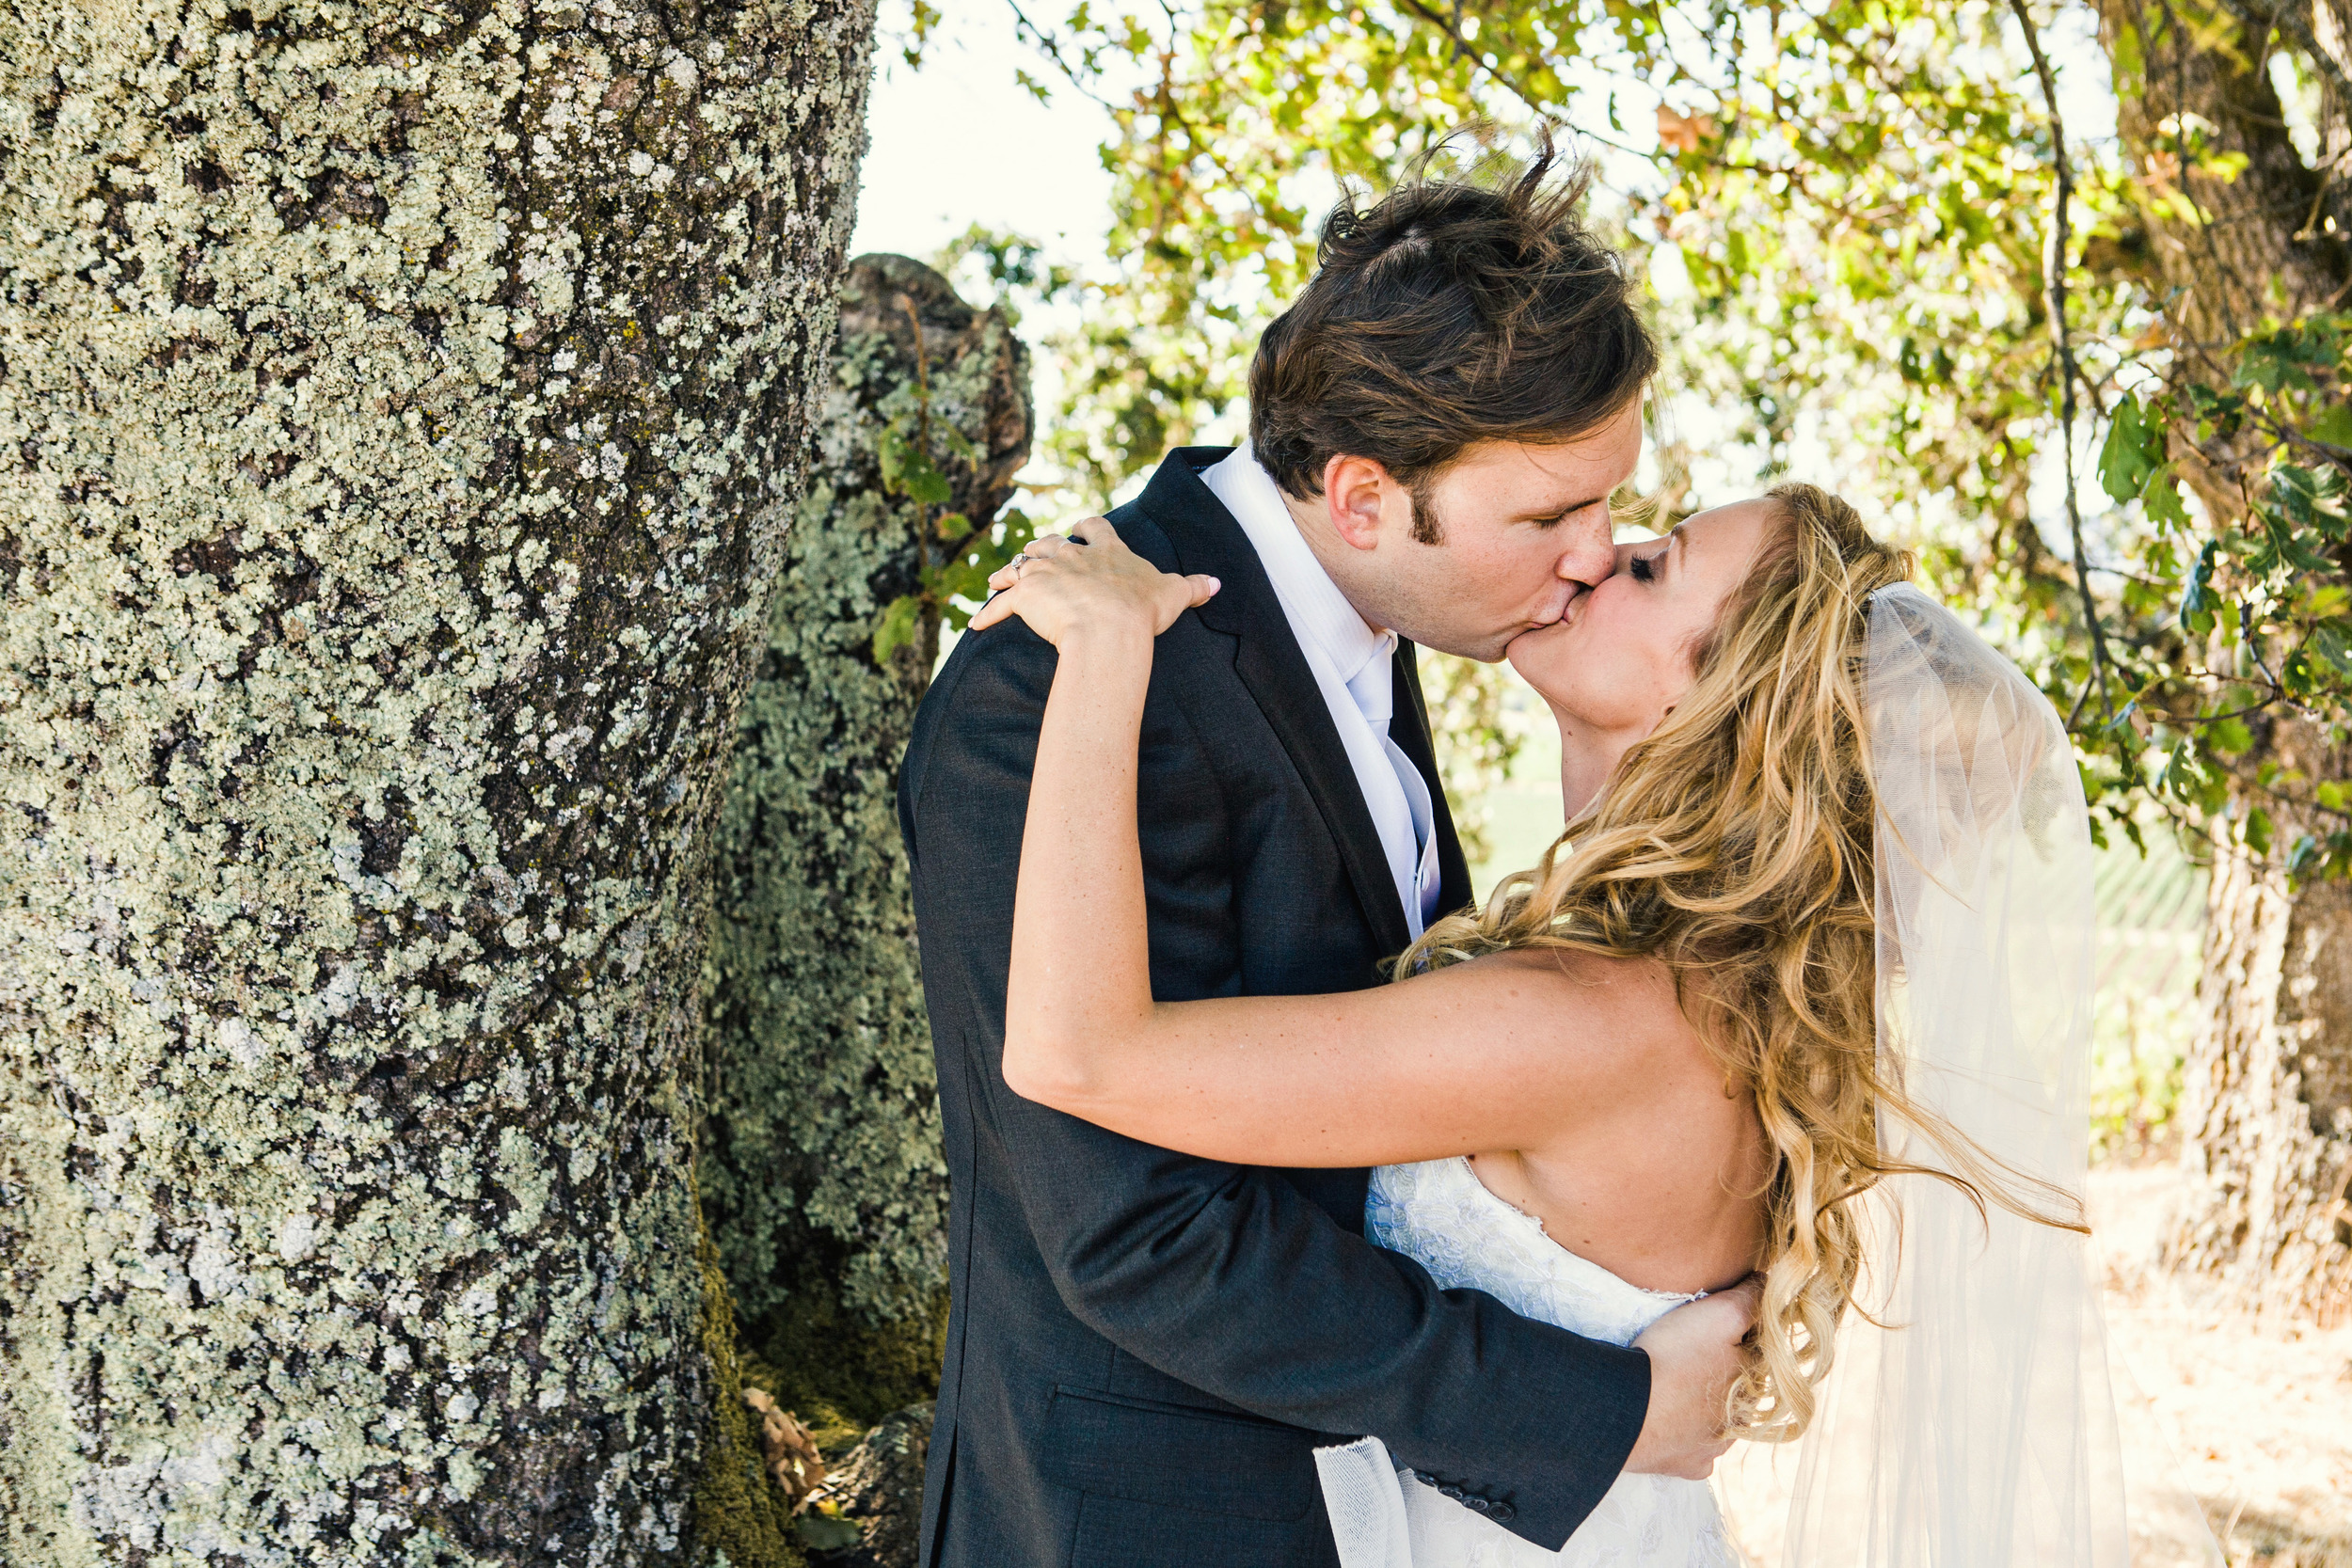 13. Bride & groom kissing in a tree, napa wedding, vineyard ceremony.jpg